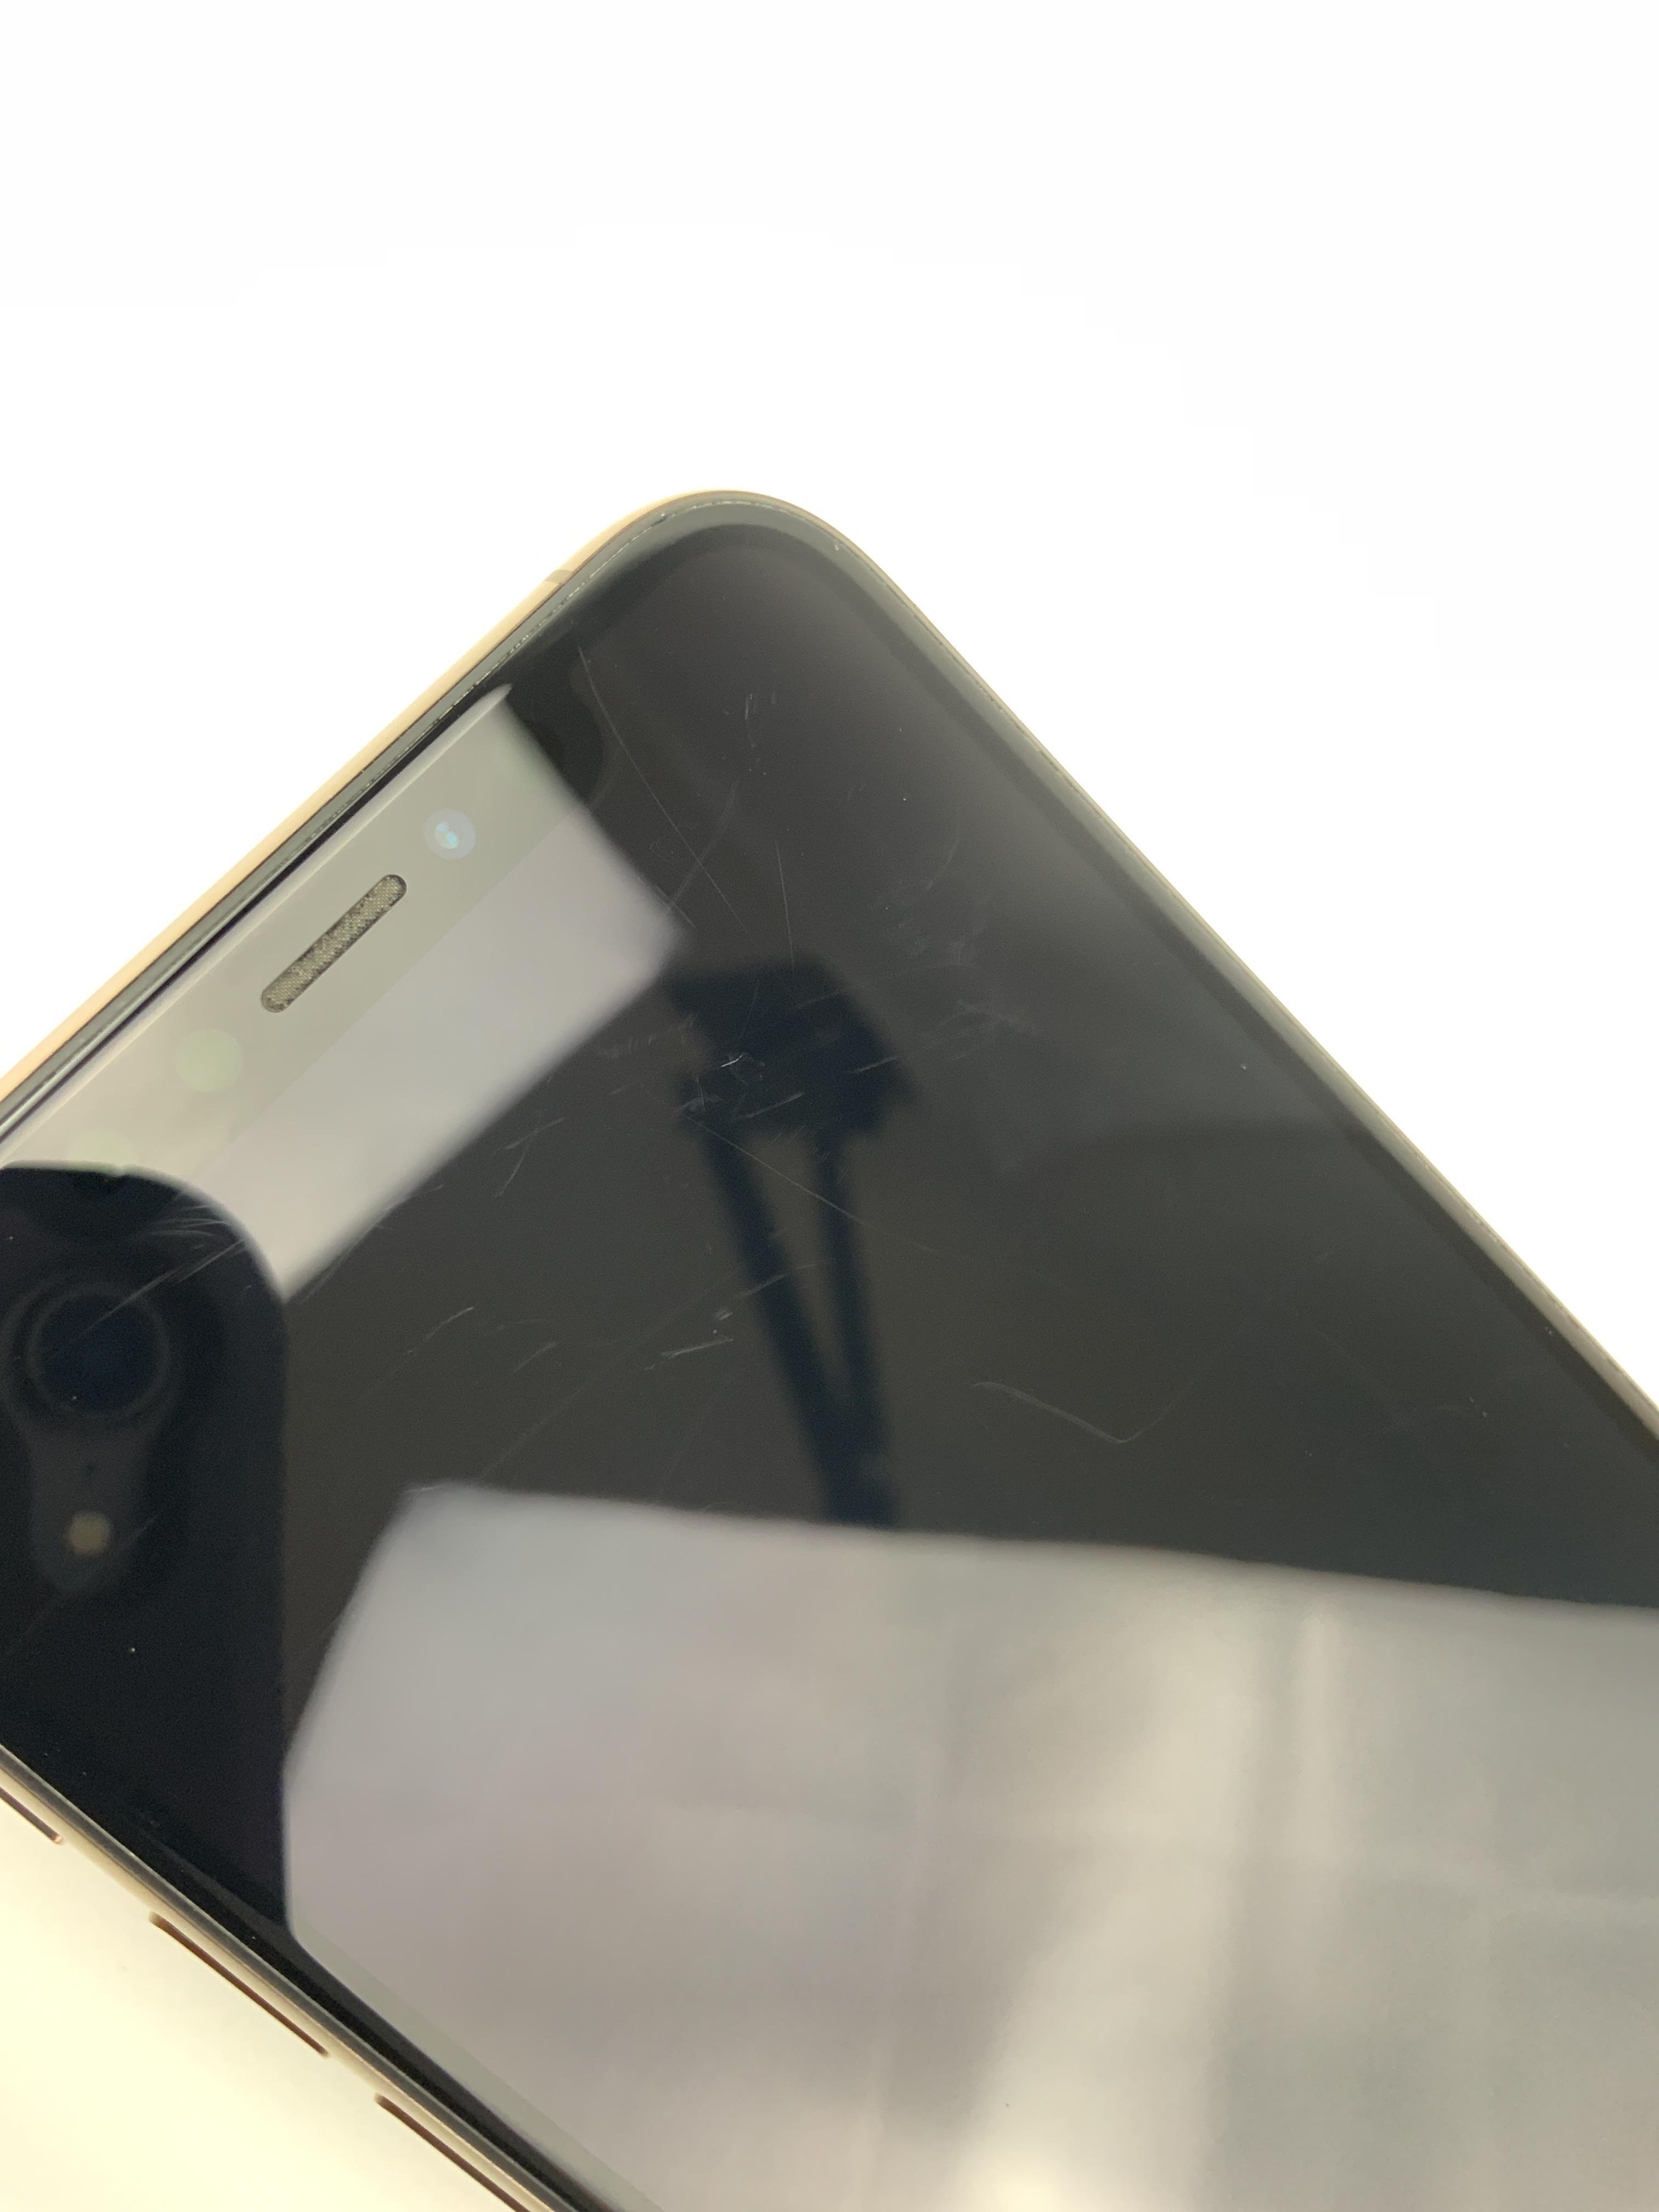 iPhone XS 64GB, 64GB, Gold, Bild 3